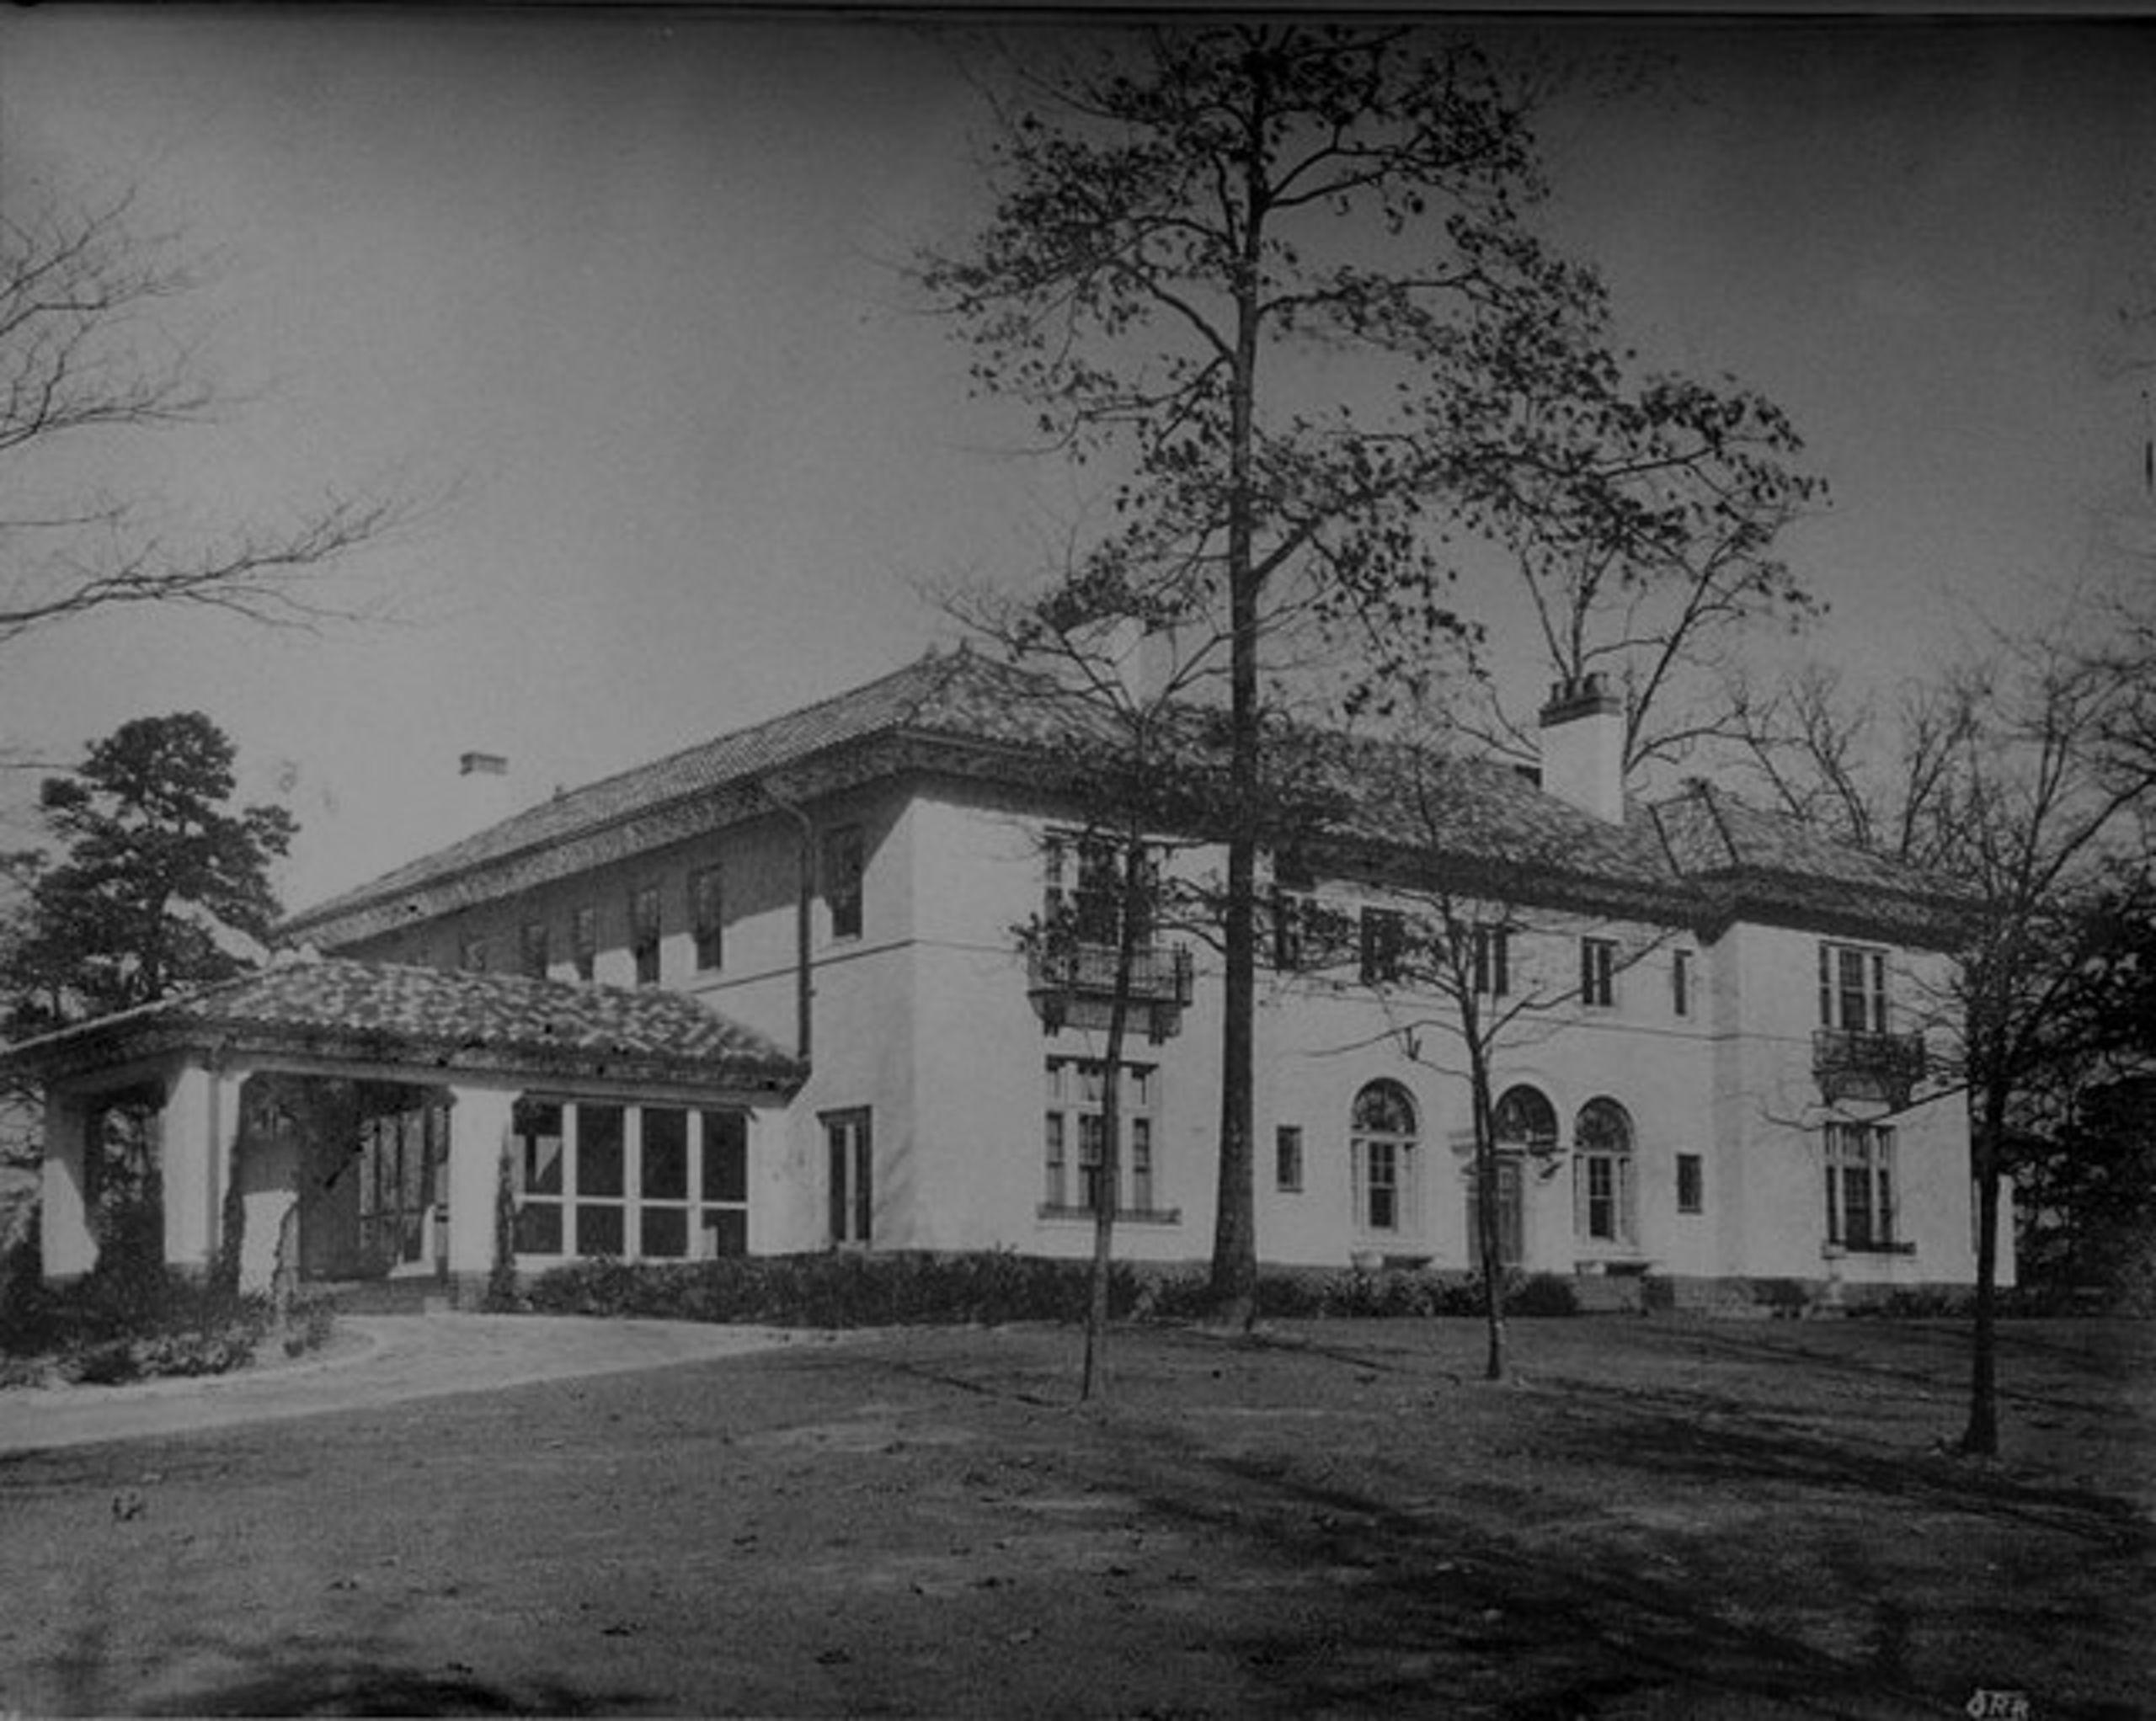 Henry Heinz Murder Mystery | Historic Atlanta Real Estate